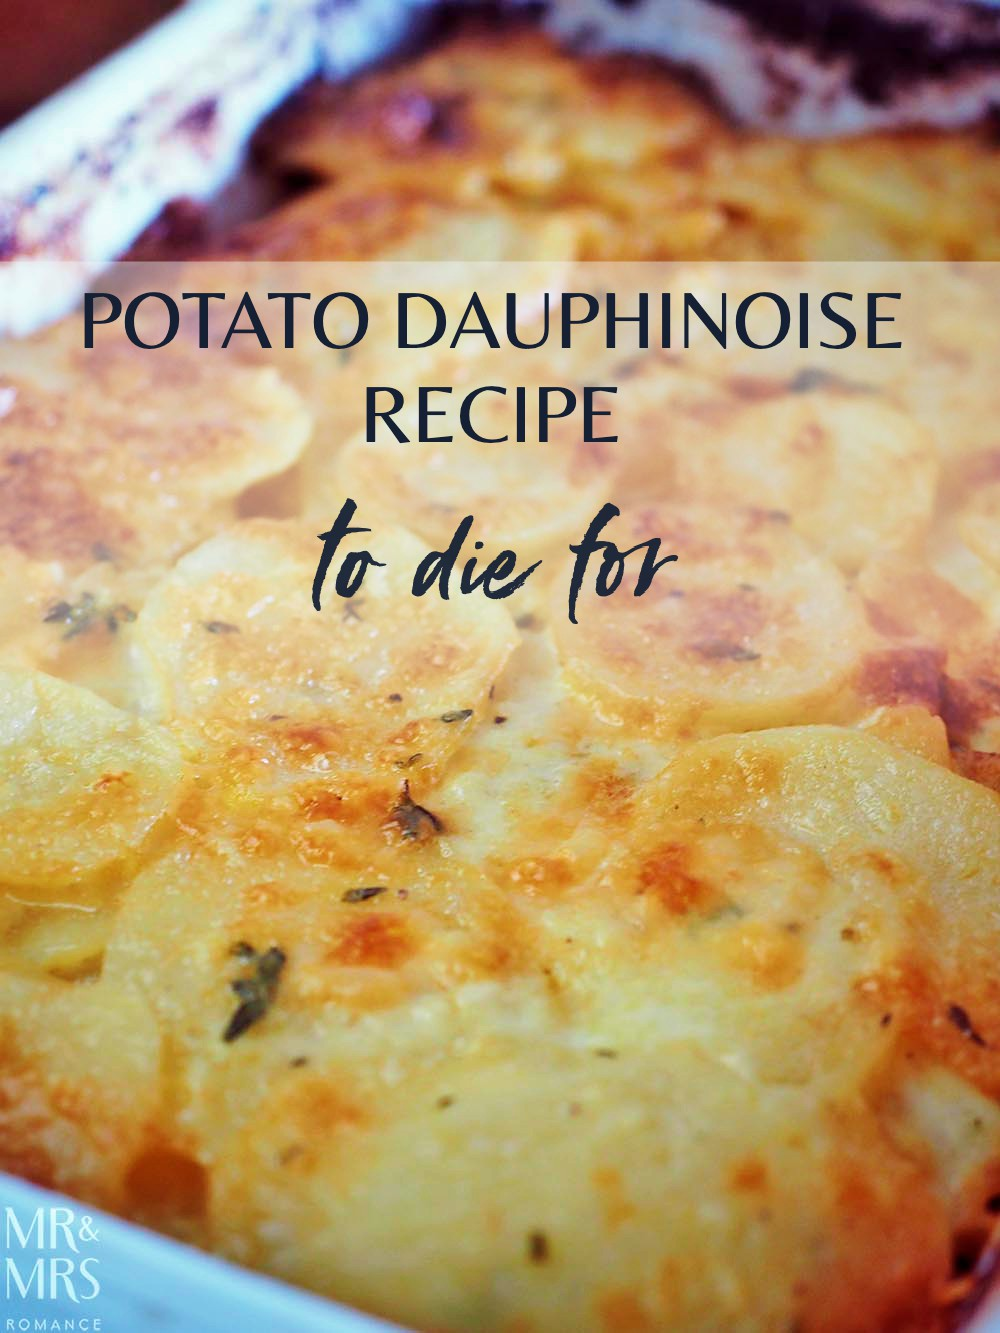 Potato dauphinoise recipe by Manu Feildel